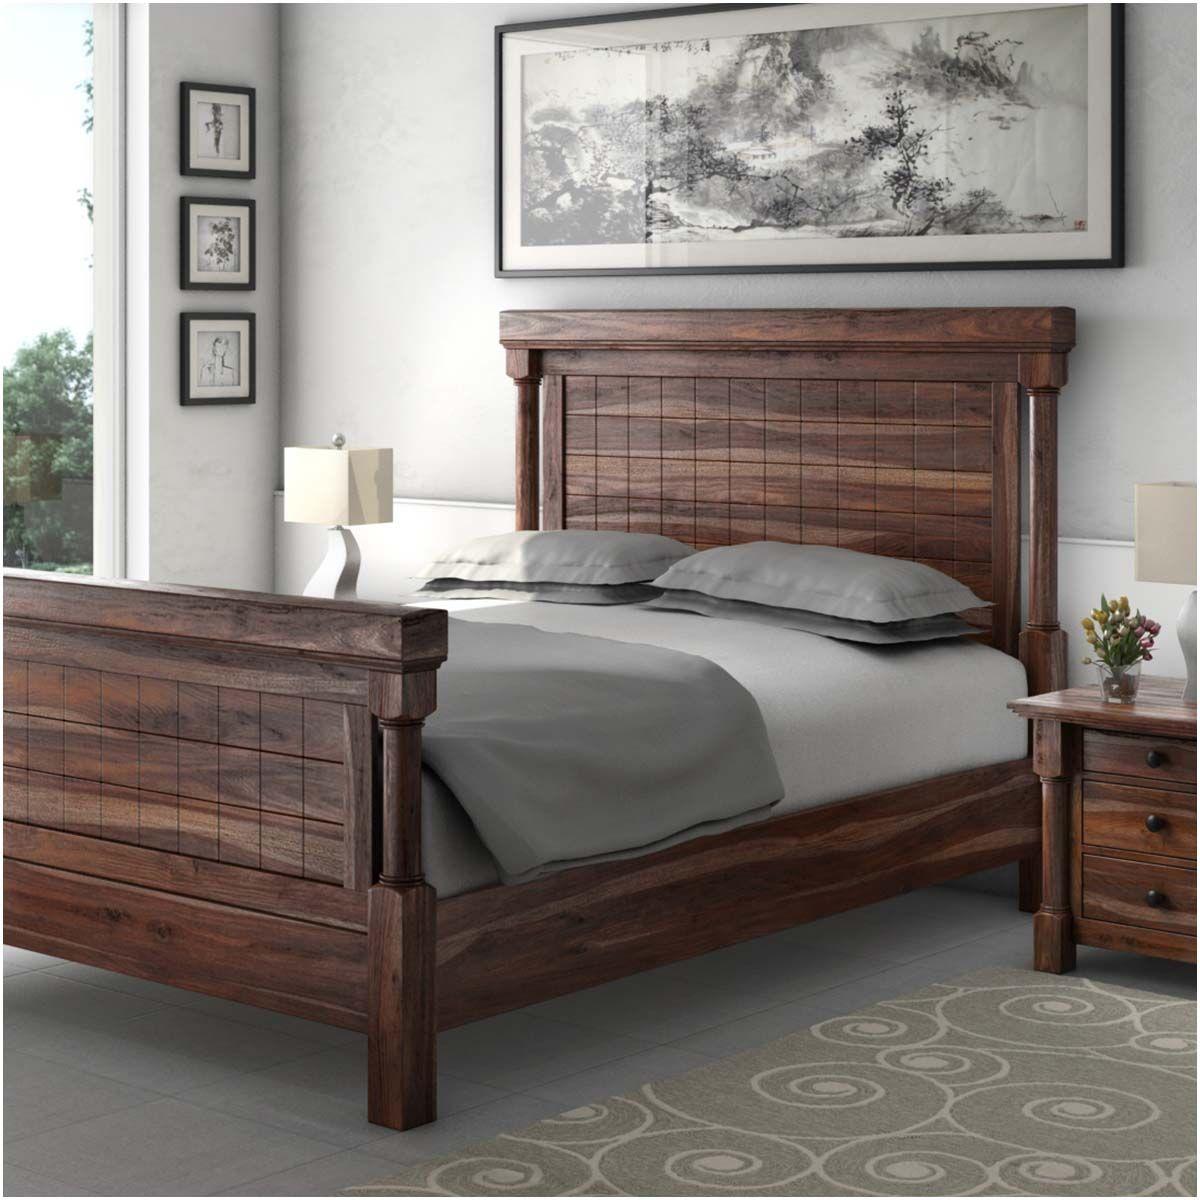 Sierra Living Concepts Furniture Solid Wood Bed Bed Frame